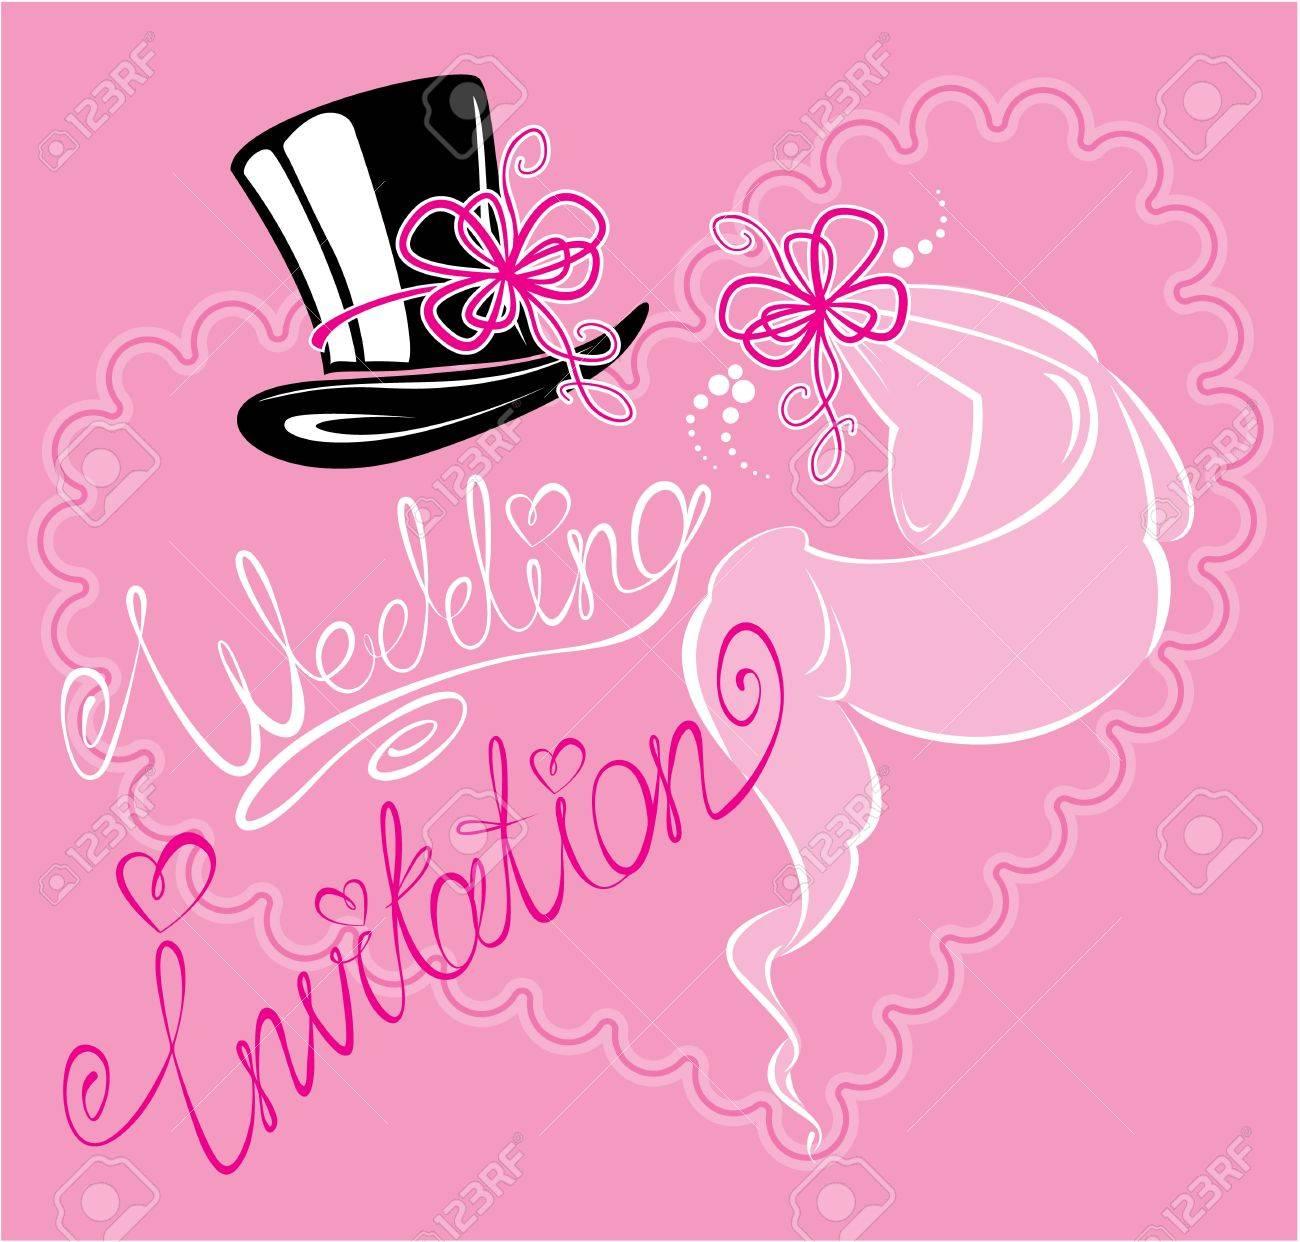 wedding invitation card with wedding veil and groom hat Stock Vector - 19145779